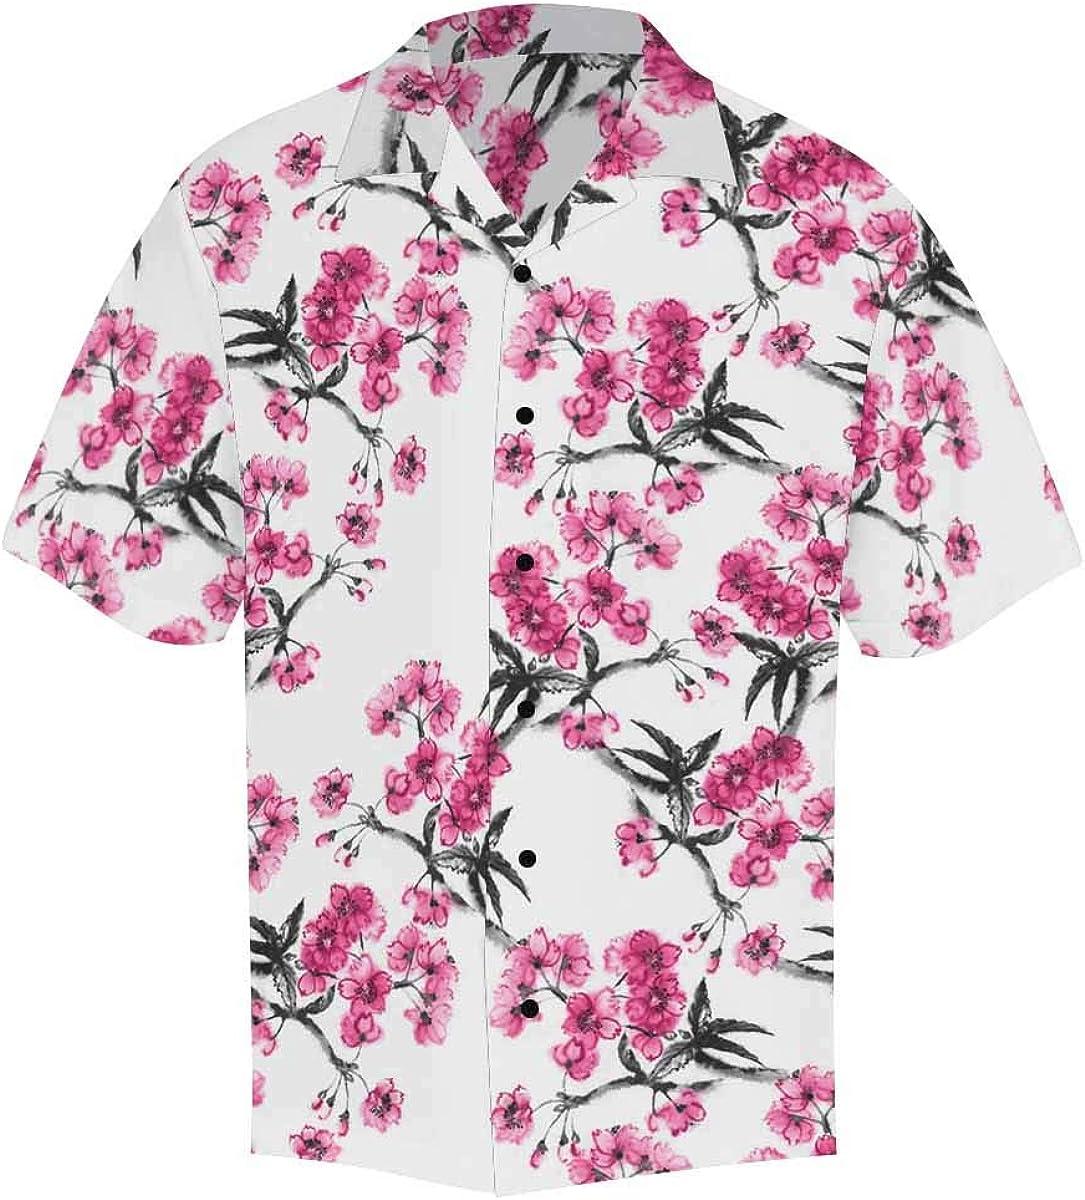 InterestPrint Men's Casual Button Down Short Sleeve Orange Sliced Sunglasses Hawaiian Shirt (S-5XL)